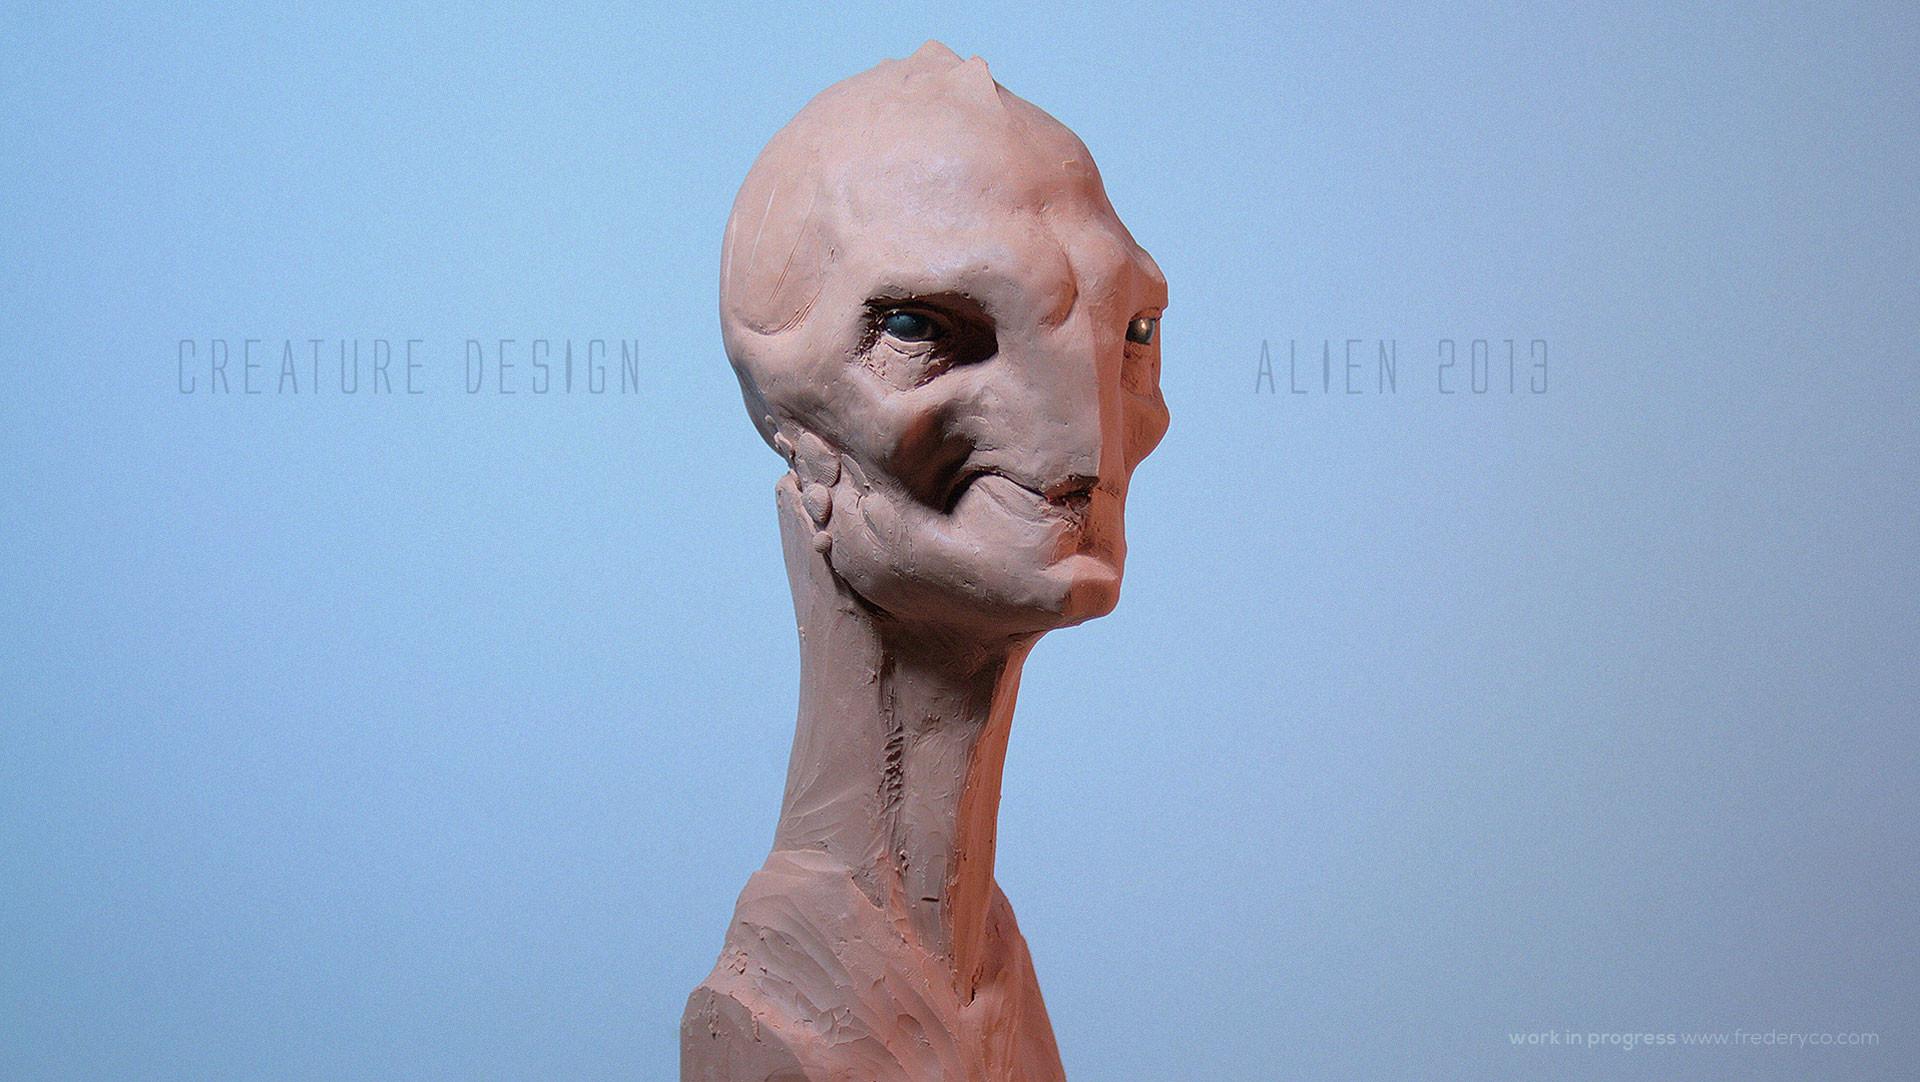 verttigo-cg-frederyco-alien-2013-wip-01